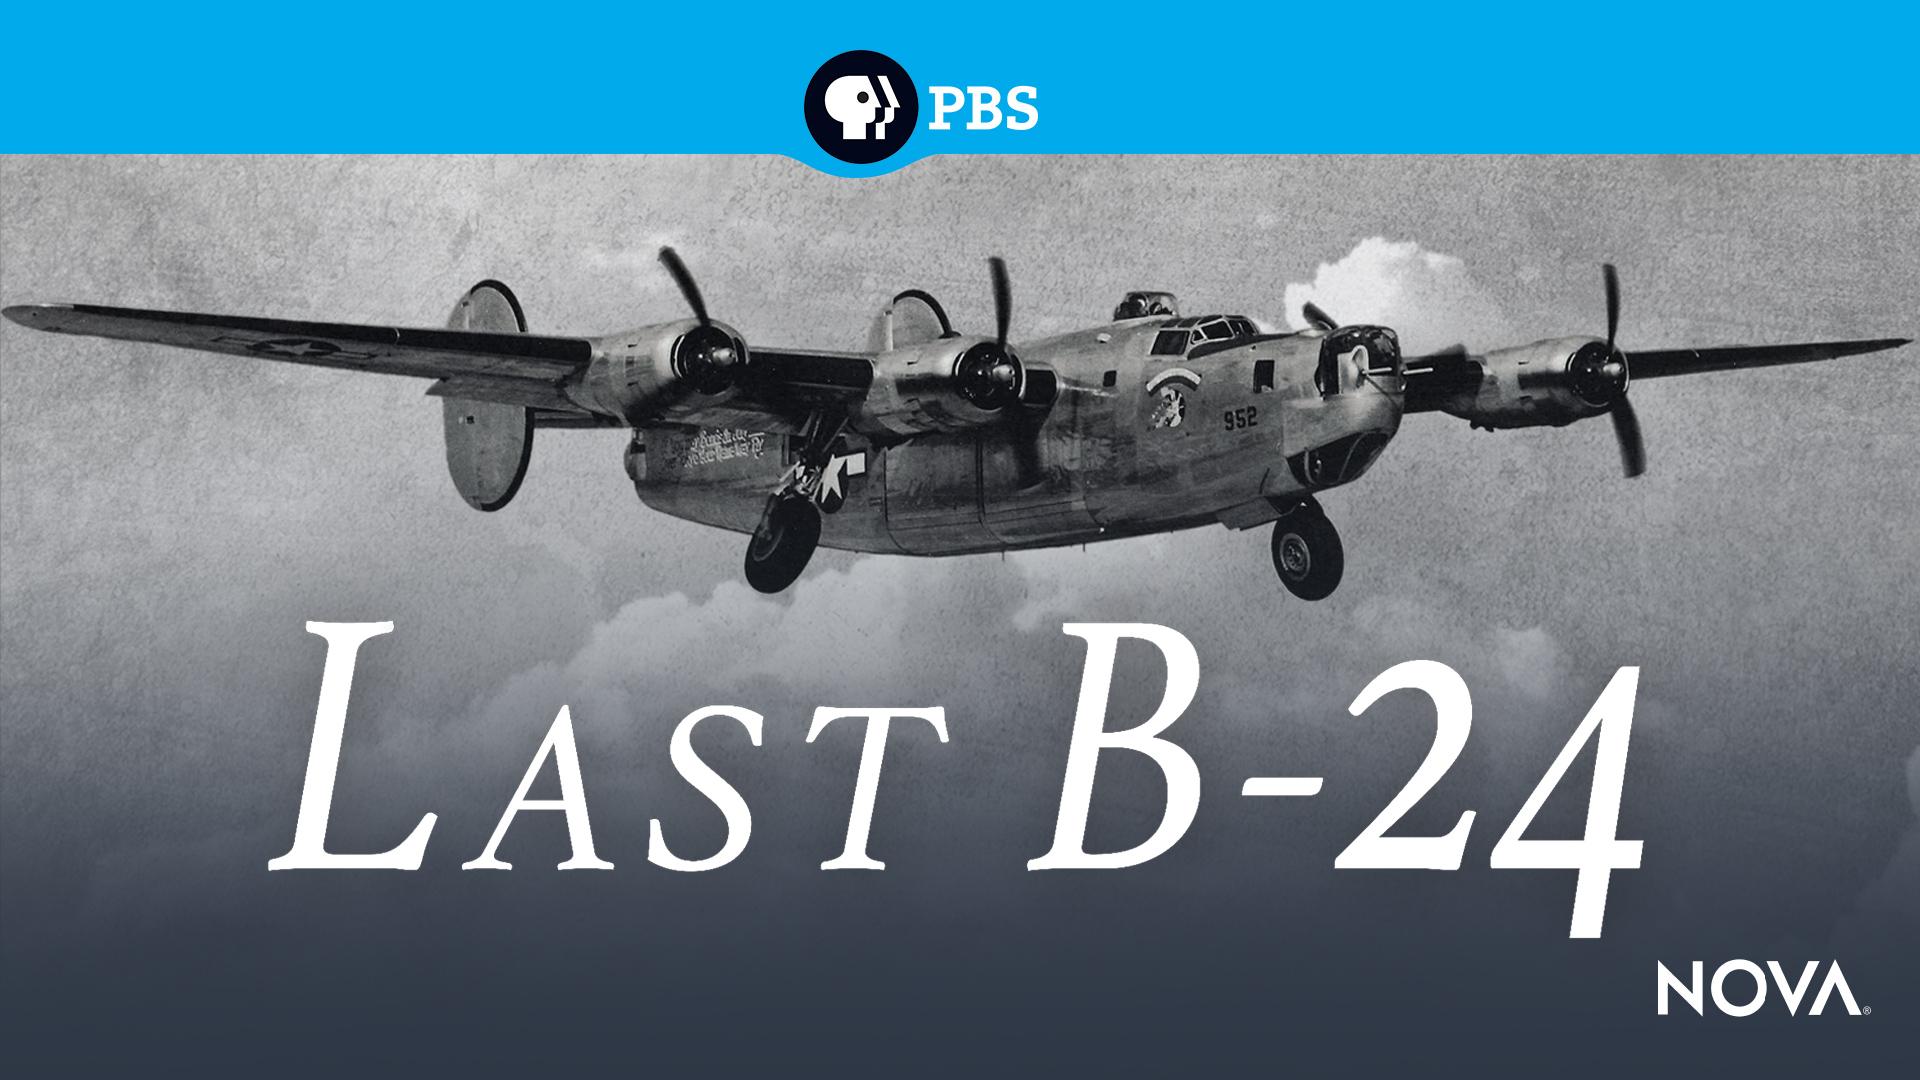 NOVA: Last B-24